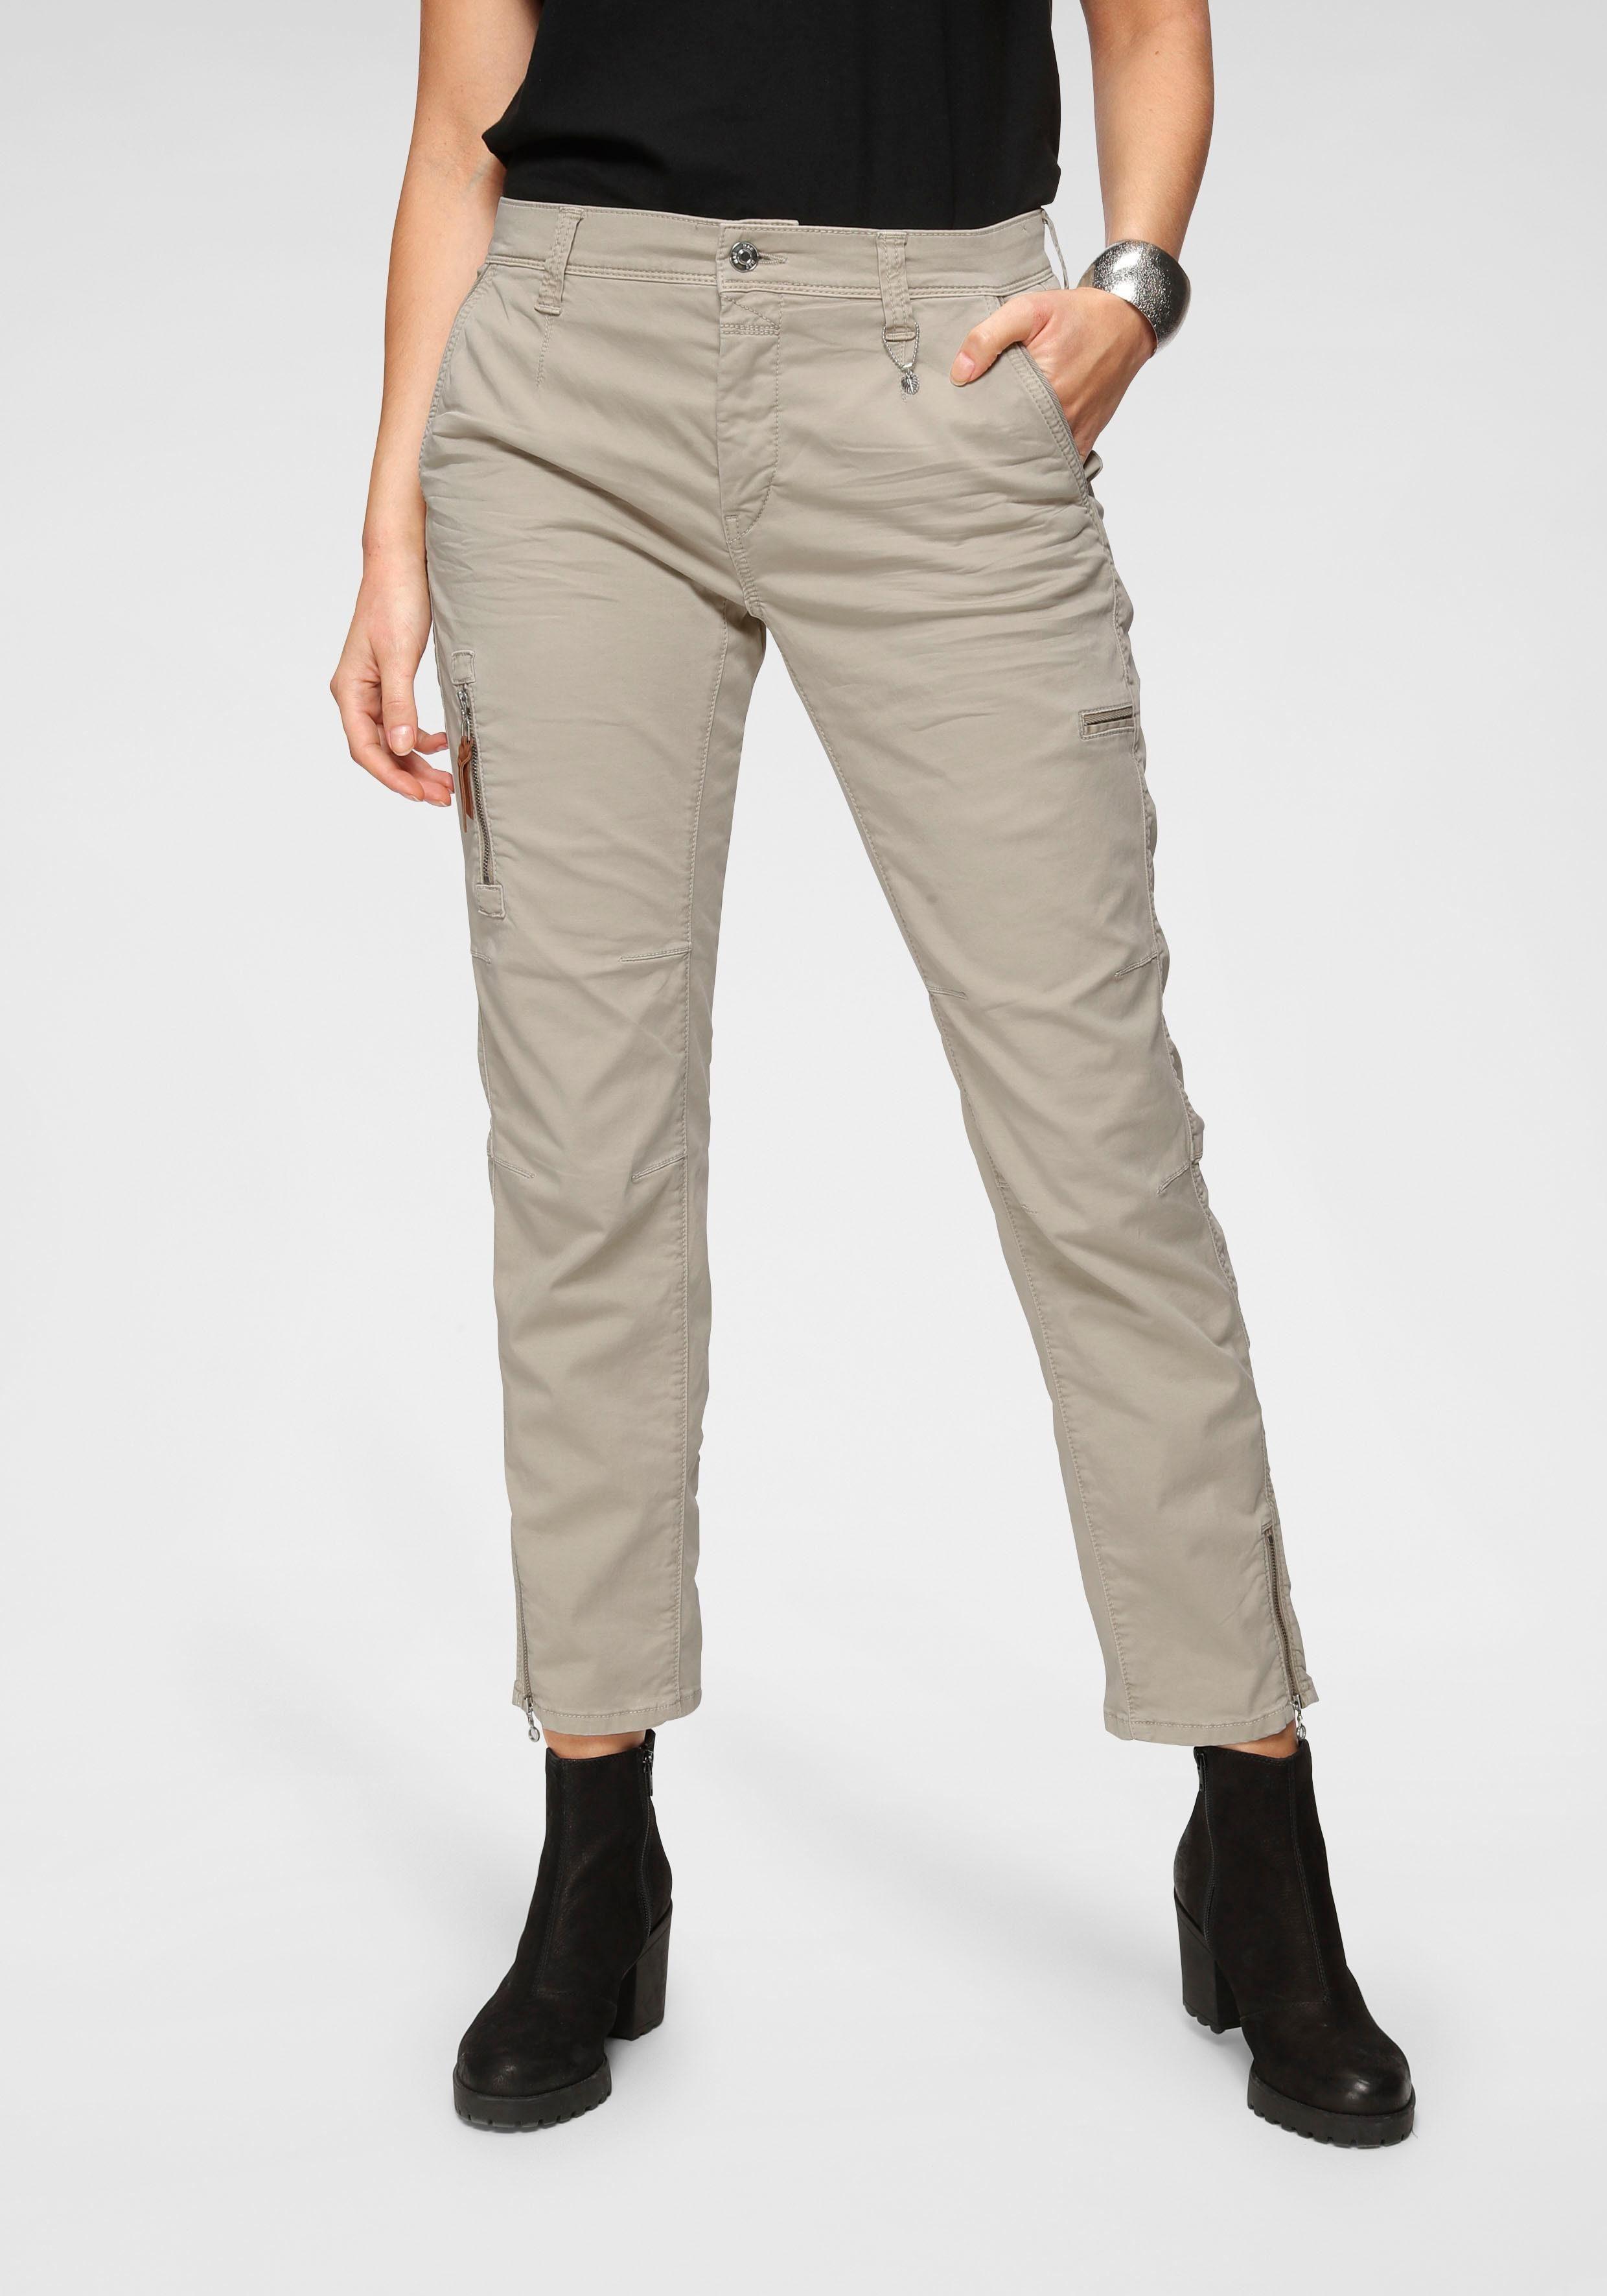 MAC Cargojeans Rich-Cargo-Cotton | Bekleidung > Jeans > Cargojeans | MAC